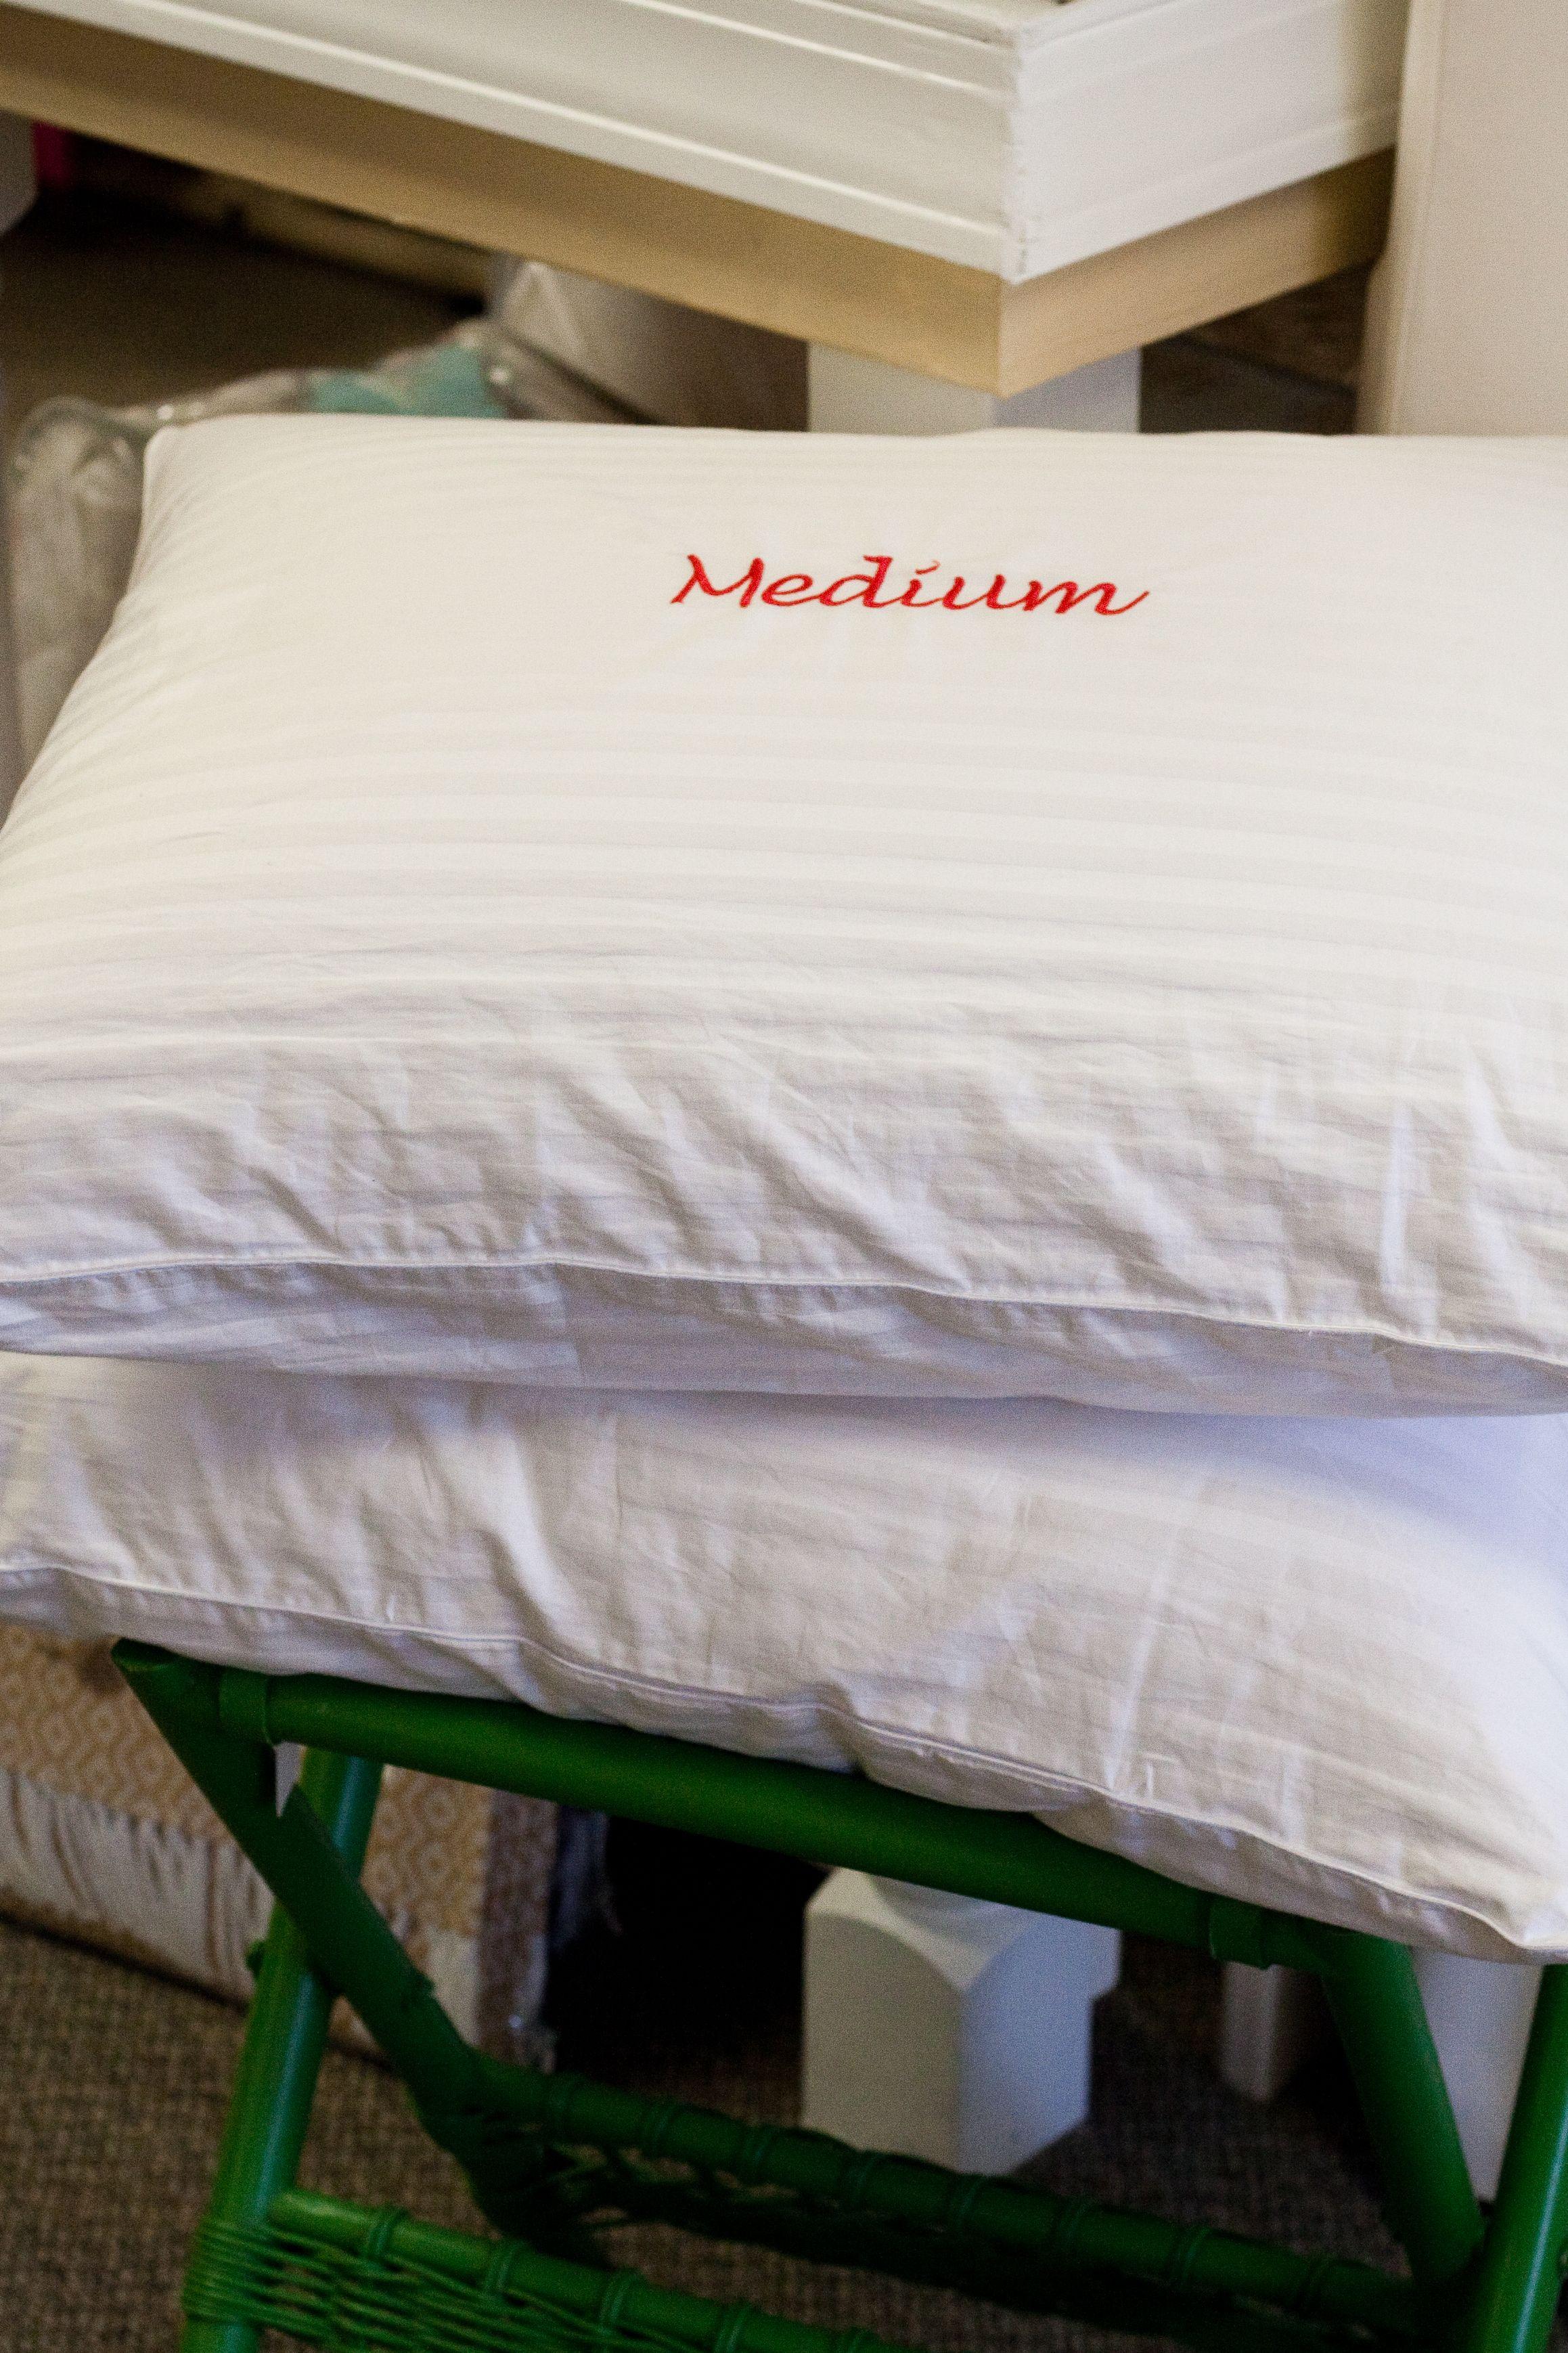 neck best cushion pillows blanket cervical pillow orthopedic gallery for uk